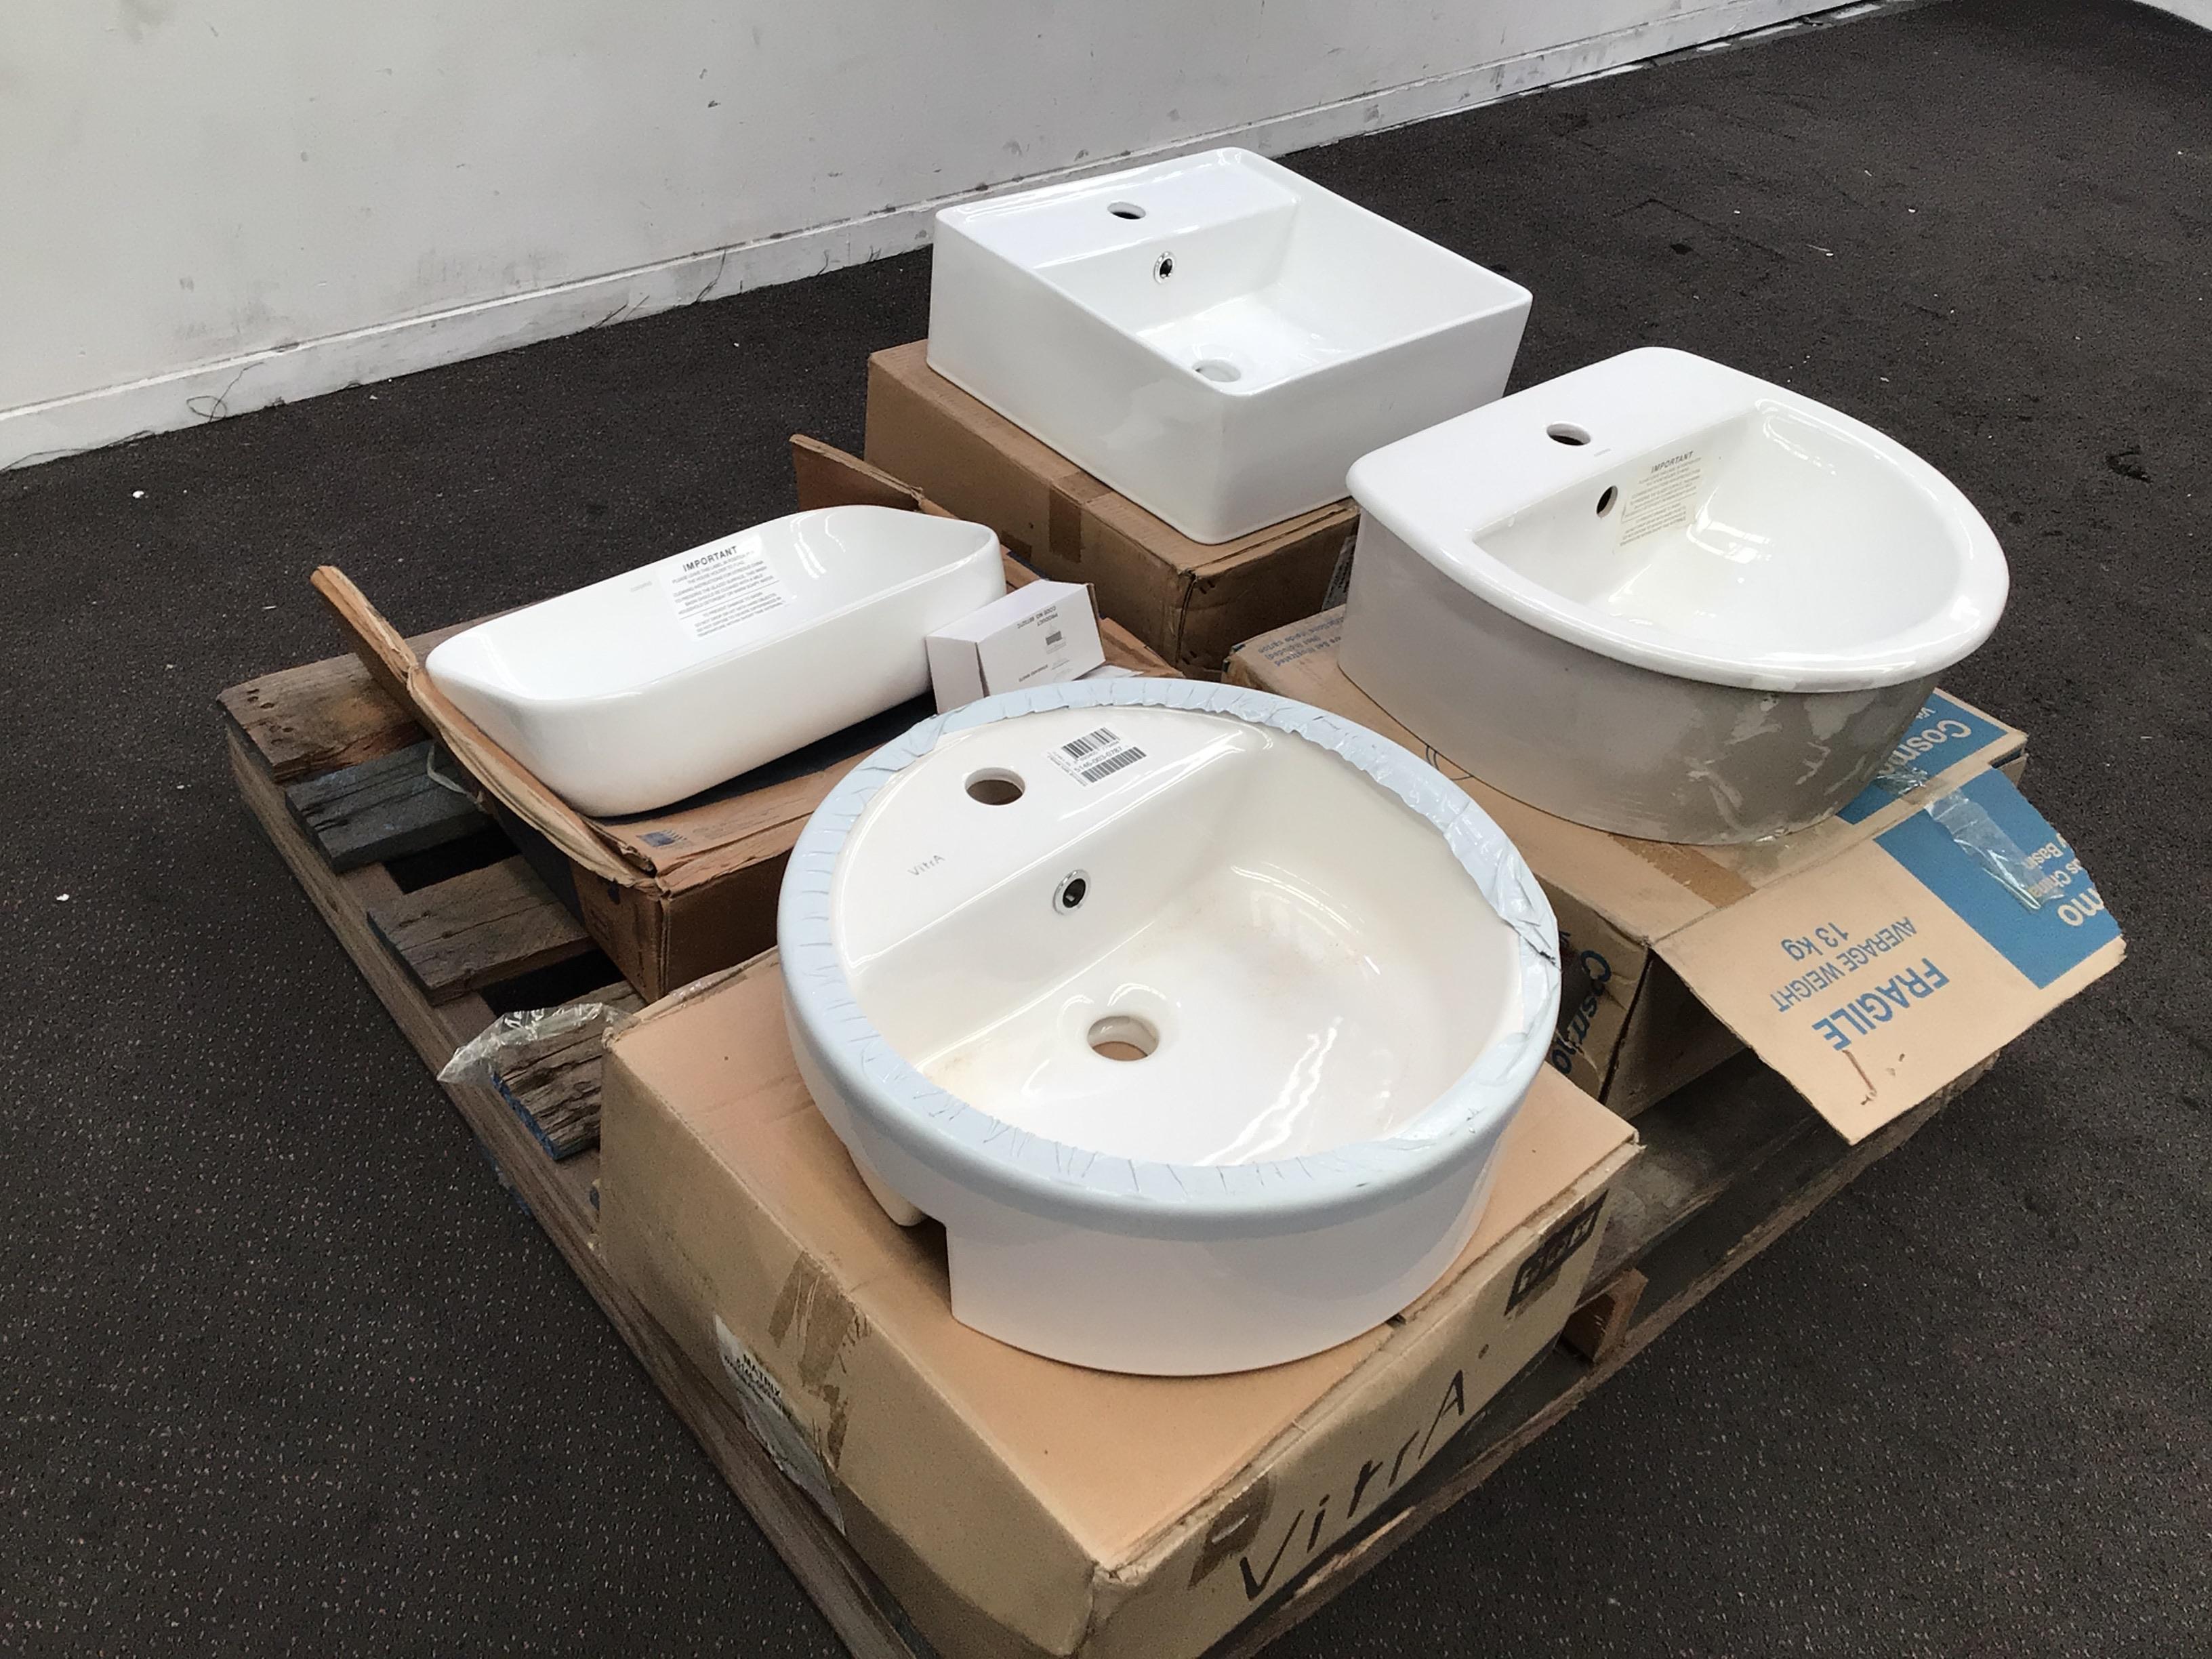 6x Various Ceramic Bathroom Basins